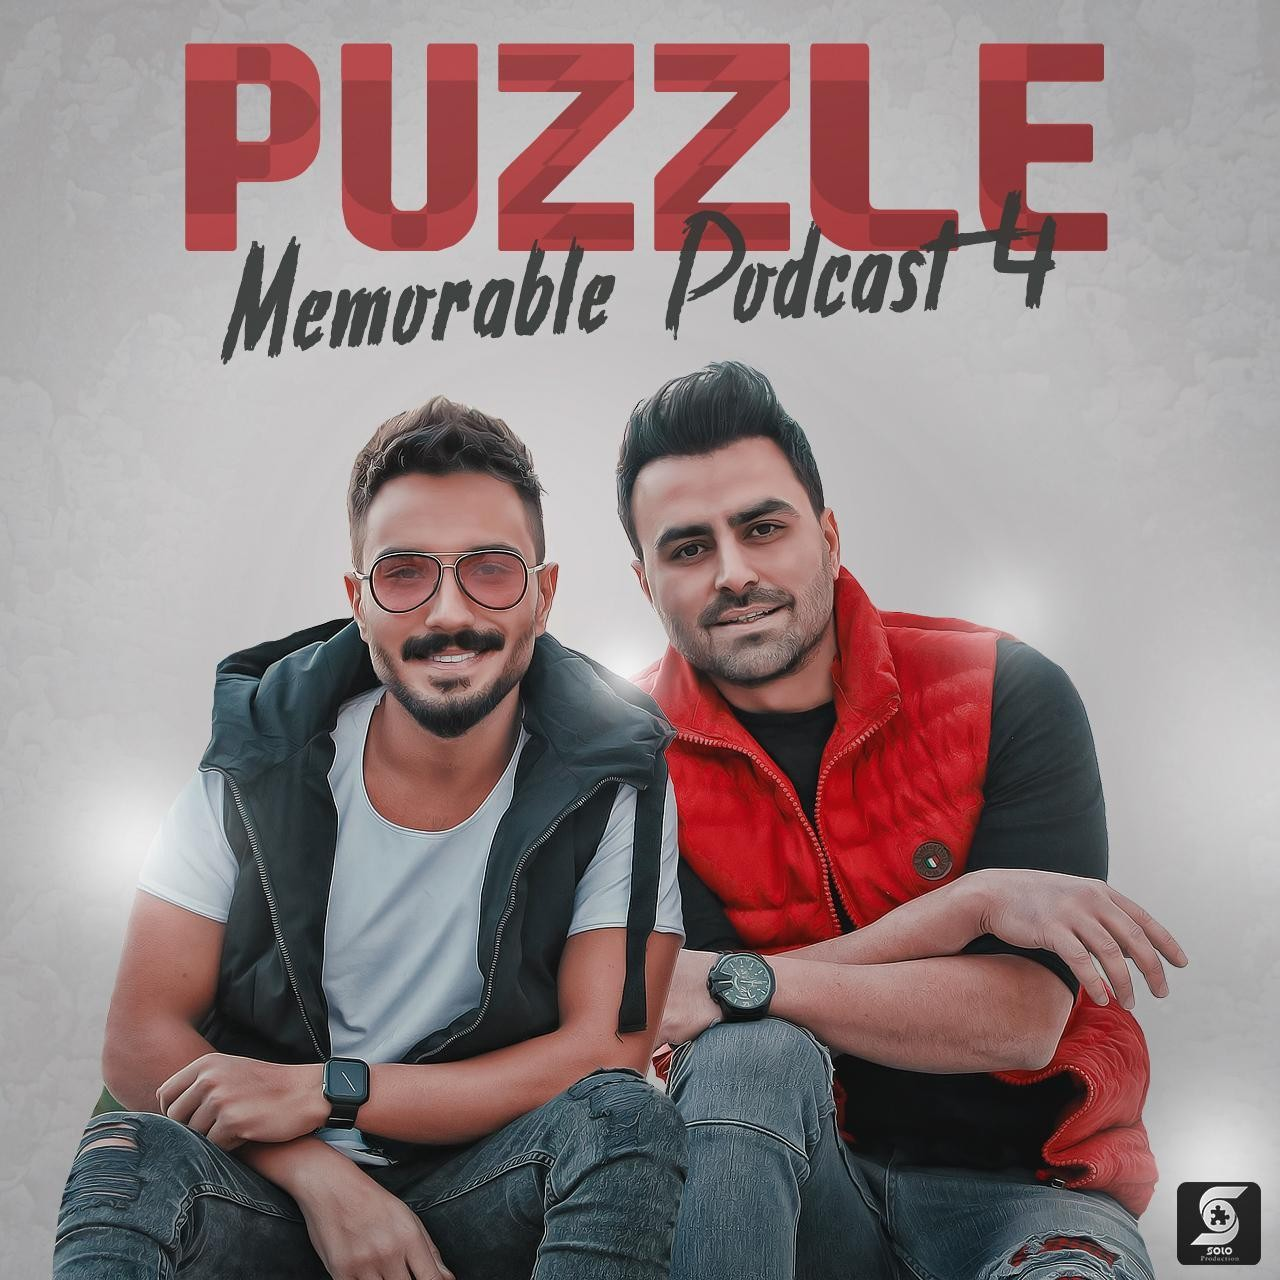 Puzzle Band - Memorable Podcast 4 - دانلود آهنگ پازل بند به نام خاطره انگیز 4